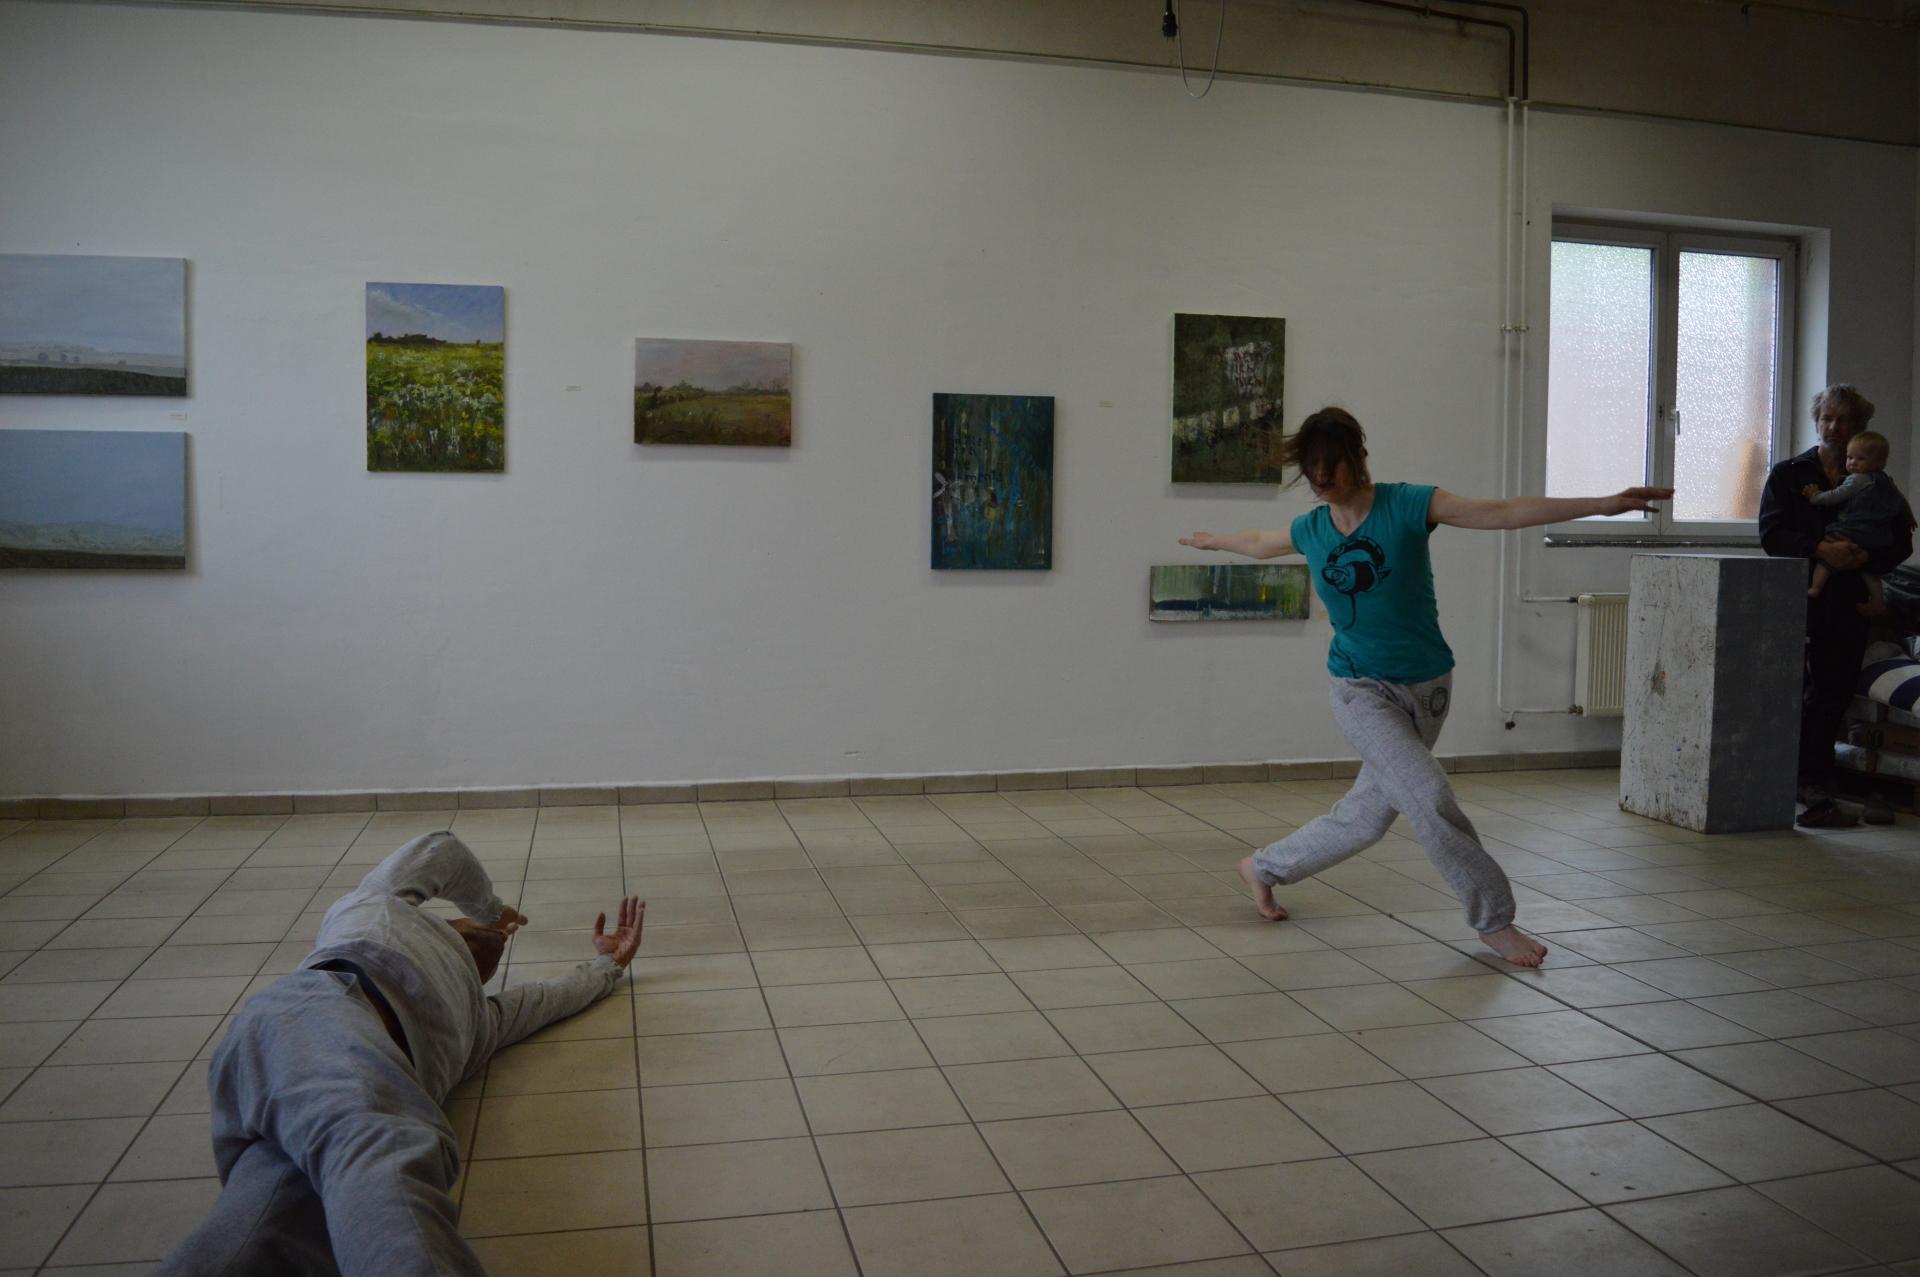 laboratorium haus 1 Lyd. Tanz/Choreographie – sharing the house